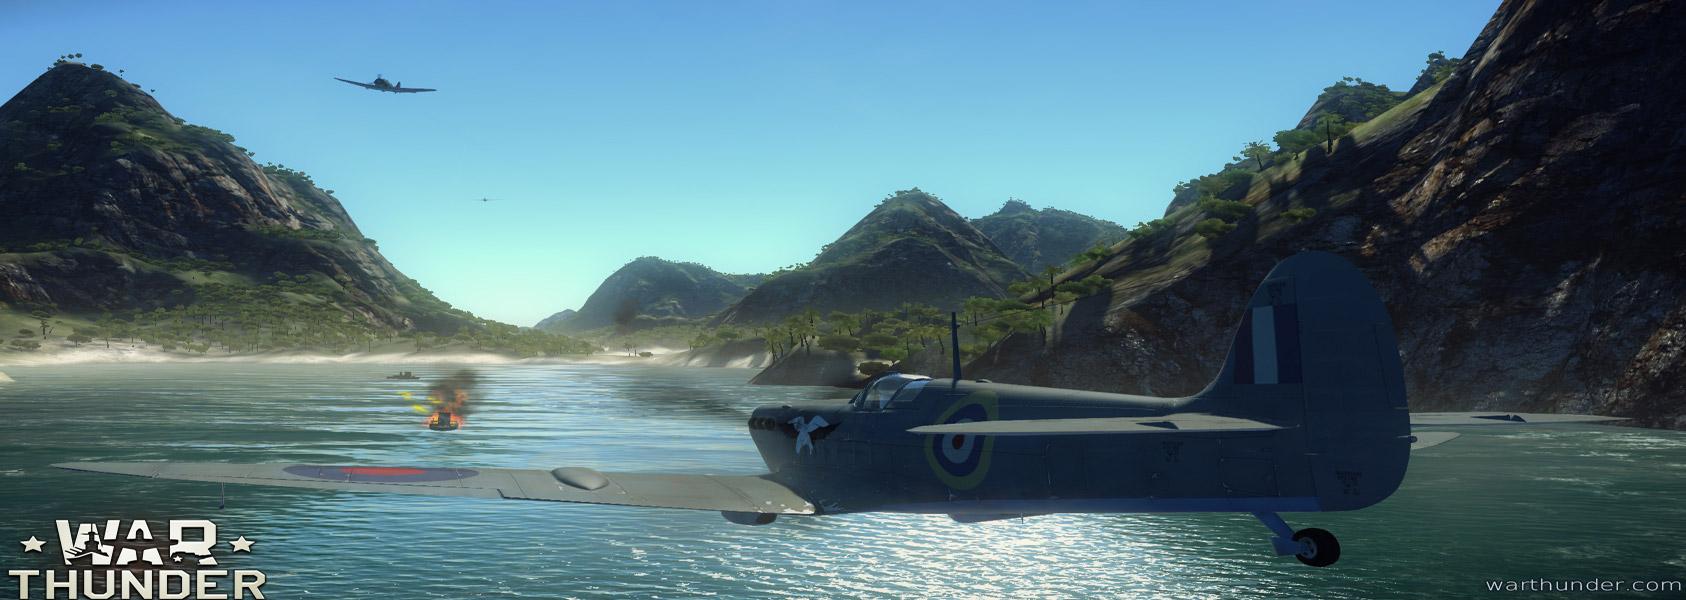 War thunder game bundle tracker marine